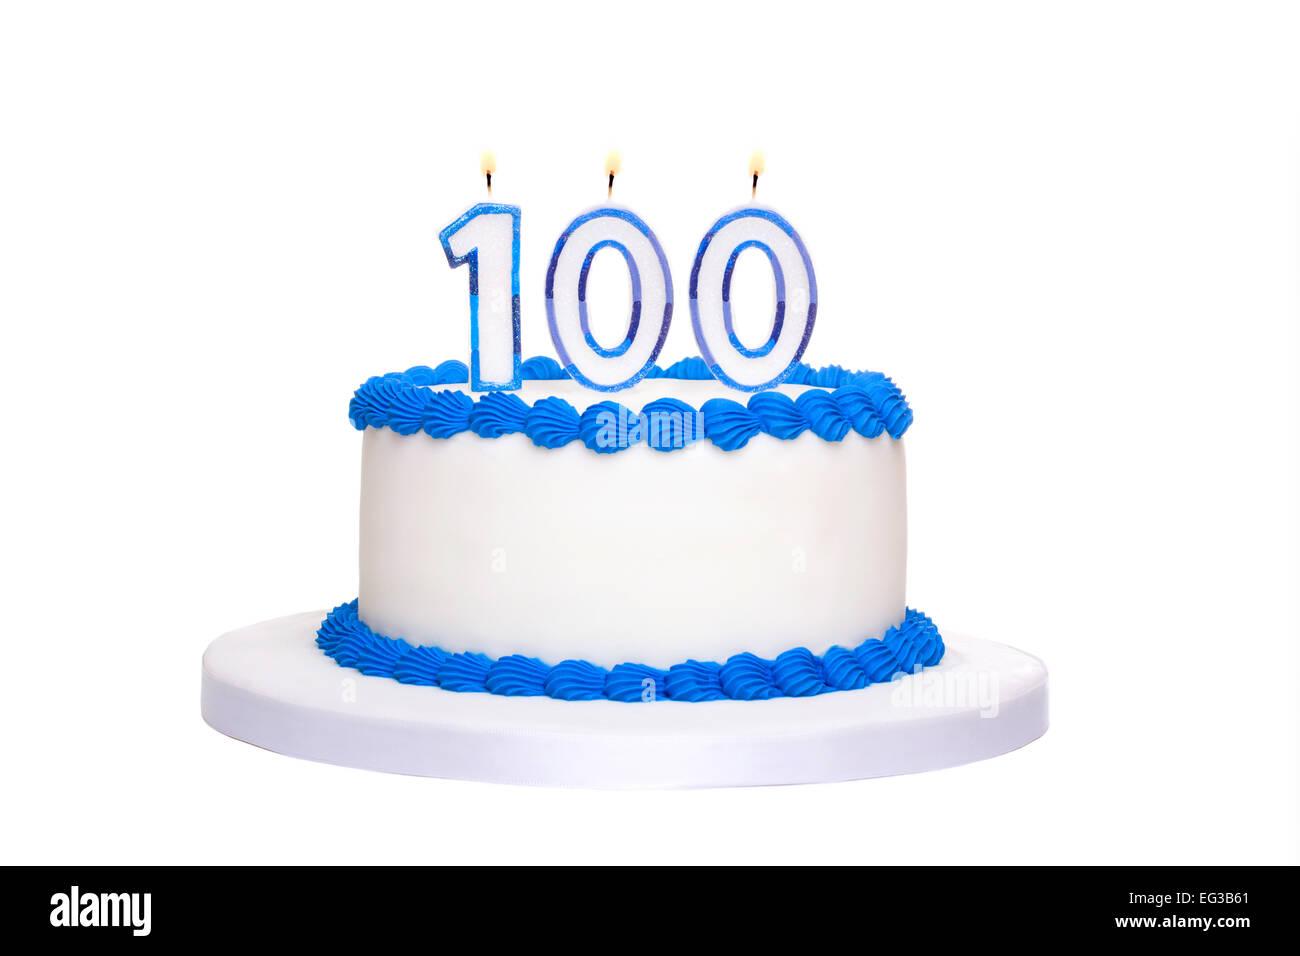 Birthday Cake 100 Candles Stock Photos Birthday Cake 100 Candles